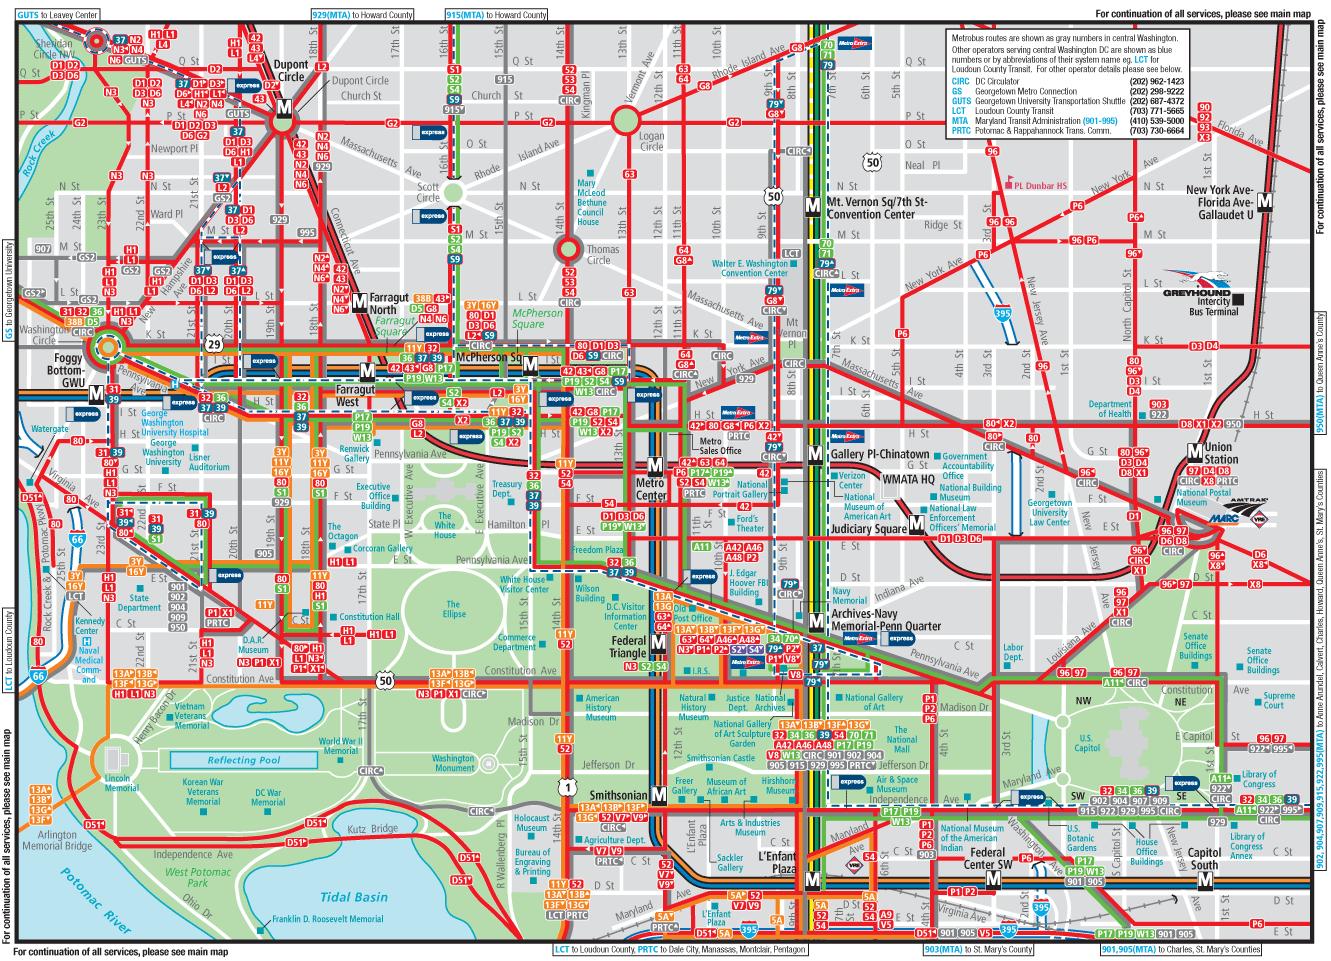 Washington Dc Downtown Metrobus Map city Center Painting